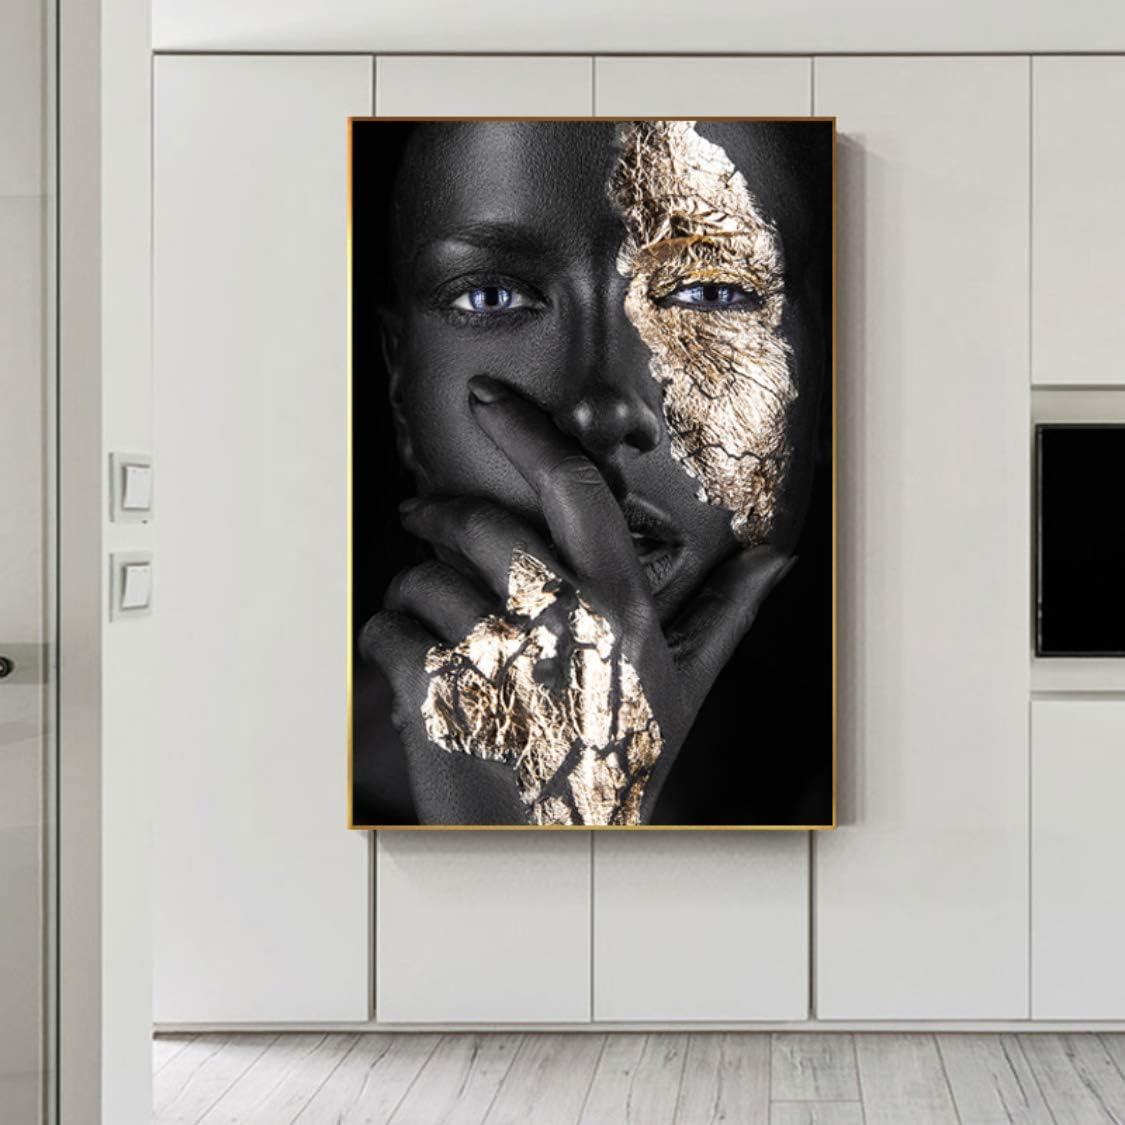 20x40 cm sin marco retrato de labios azules imagen art/ística de pared para sala de estar pintura en lienzo Decoraci/ón moderna para el hogar mujer africana negra carteles e impresiones